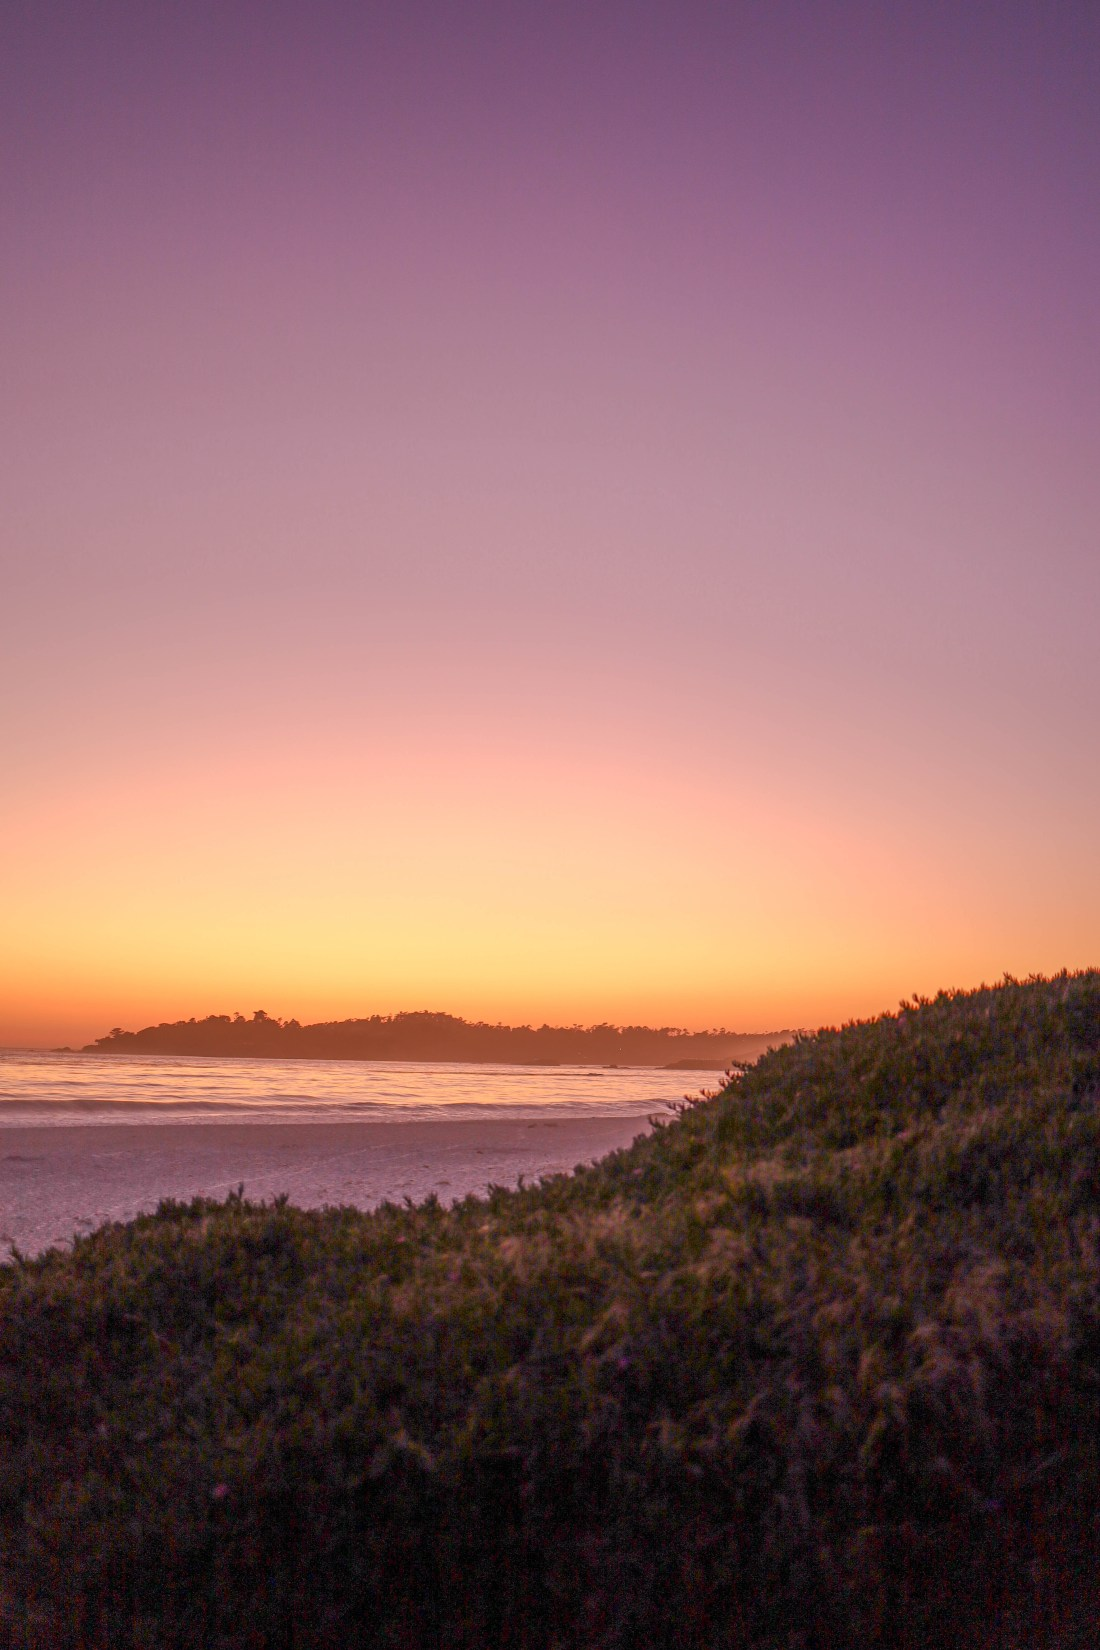 carmel by the sea sunset